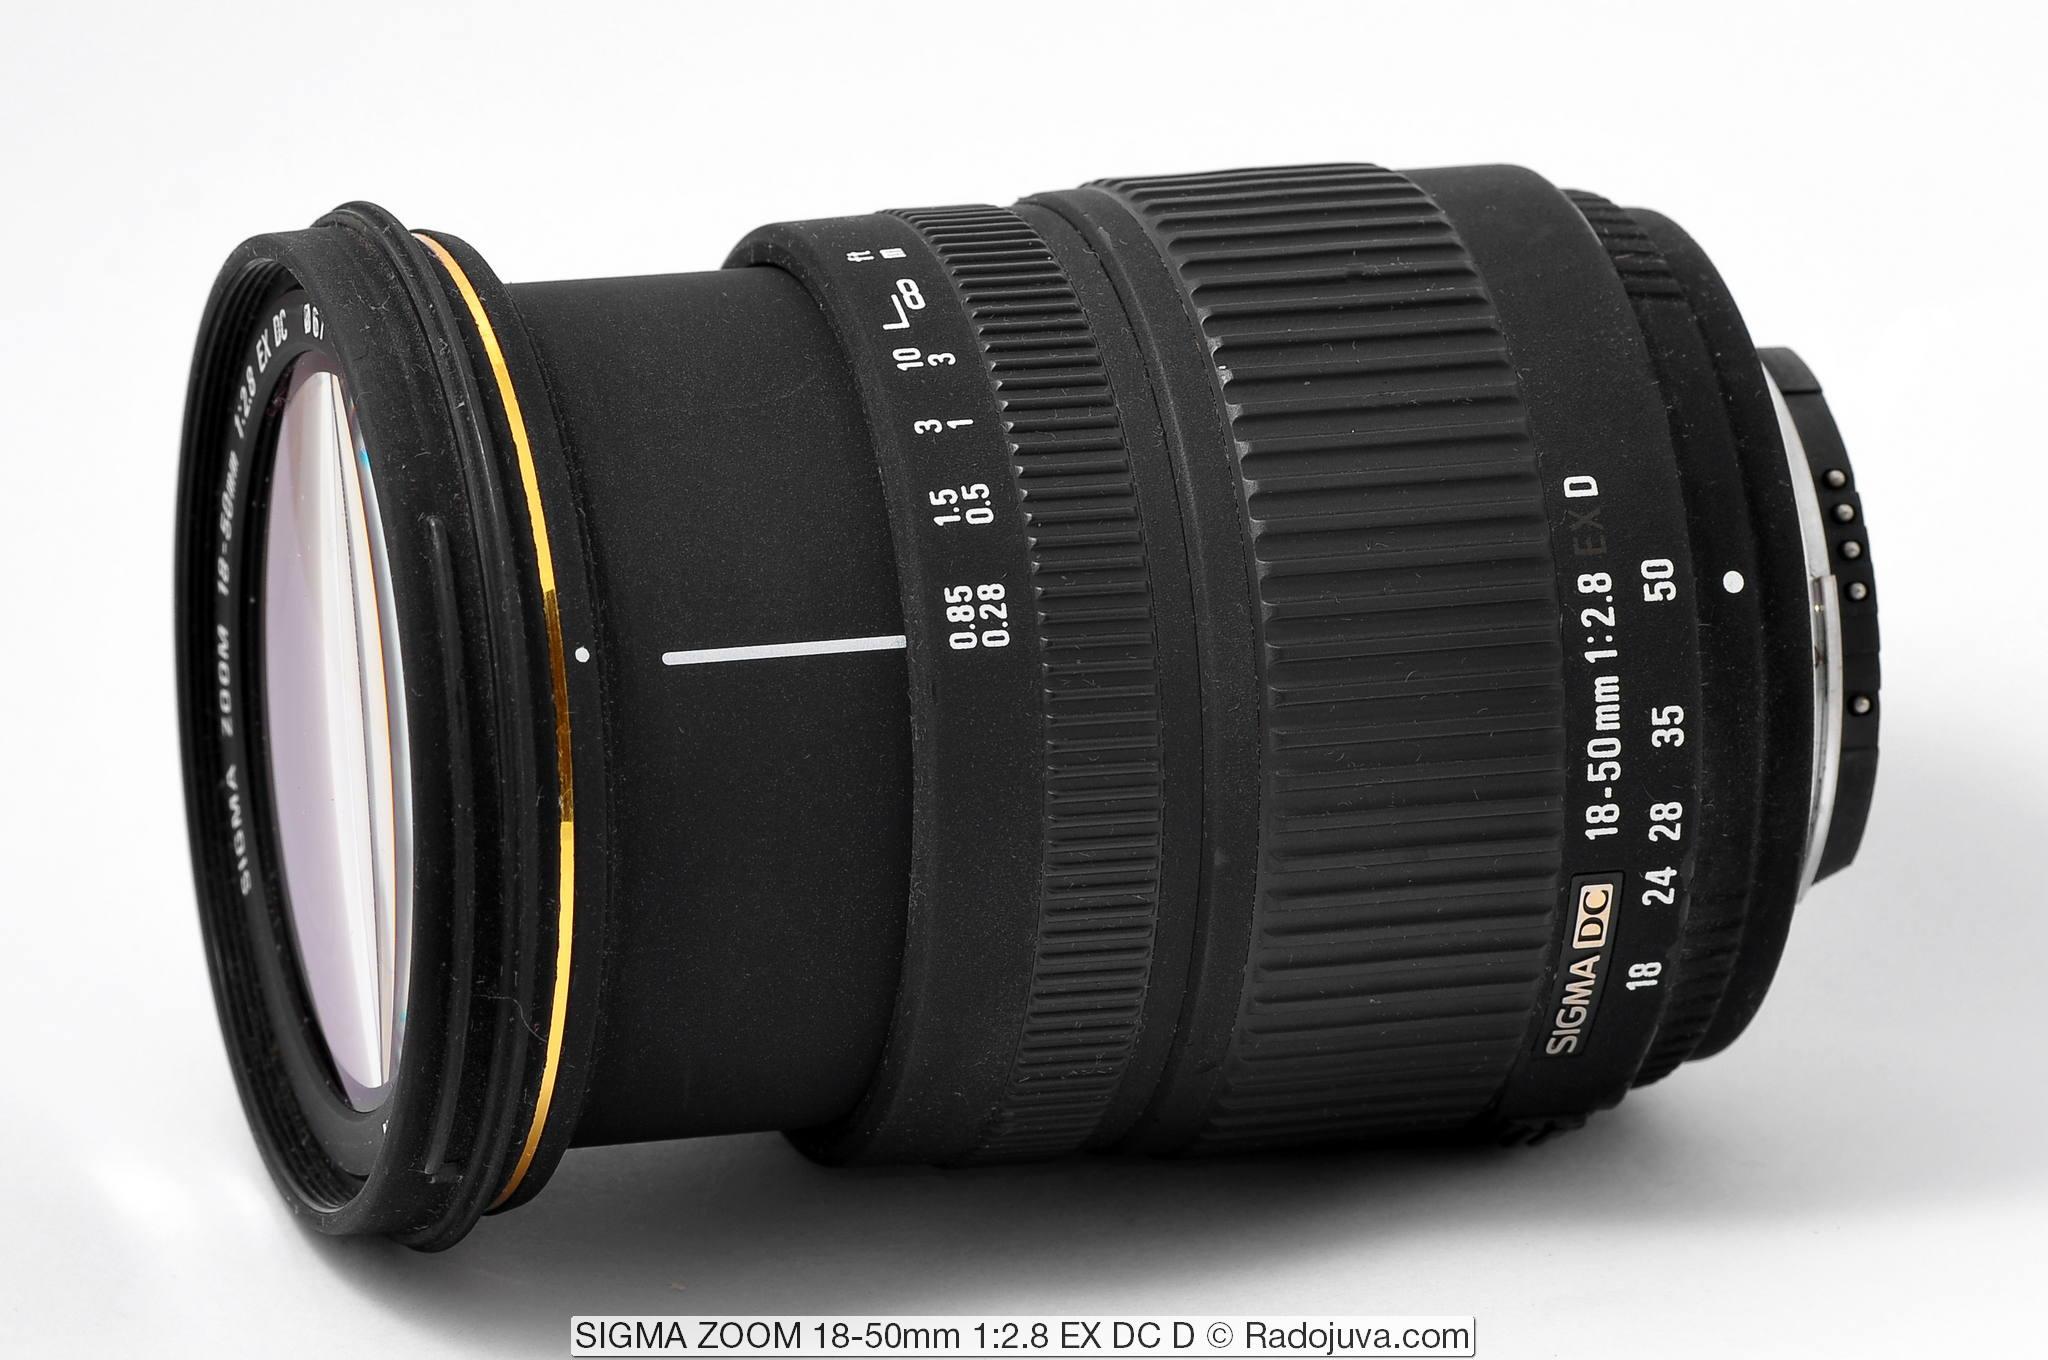 SIGMA ZOOM 18-50mm 1:2.8 EX DC (D)